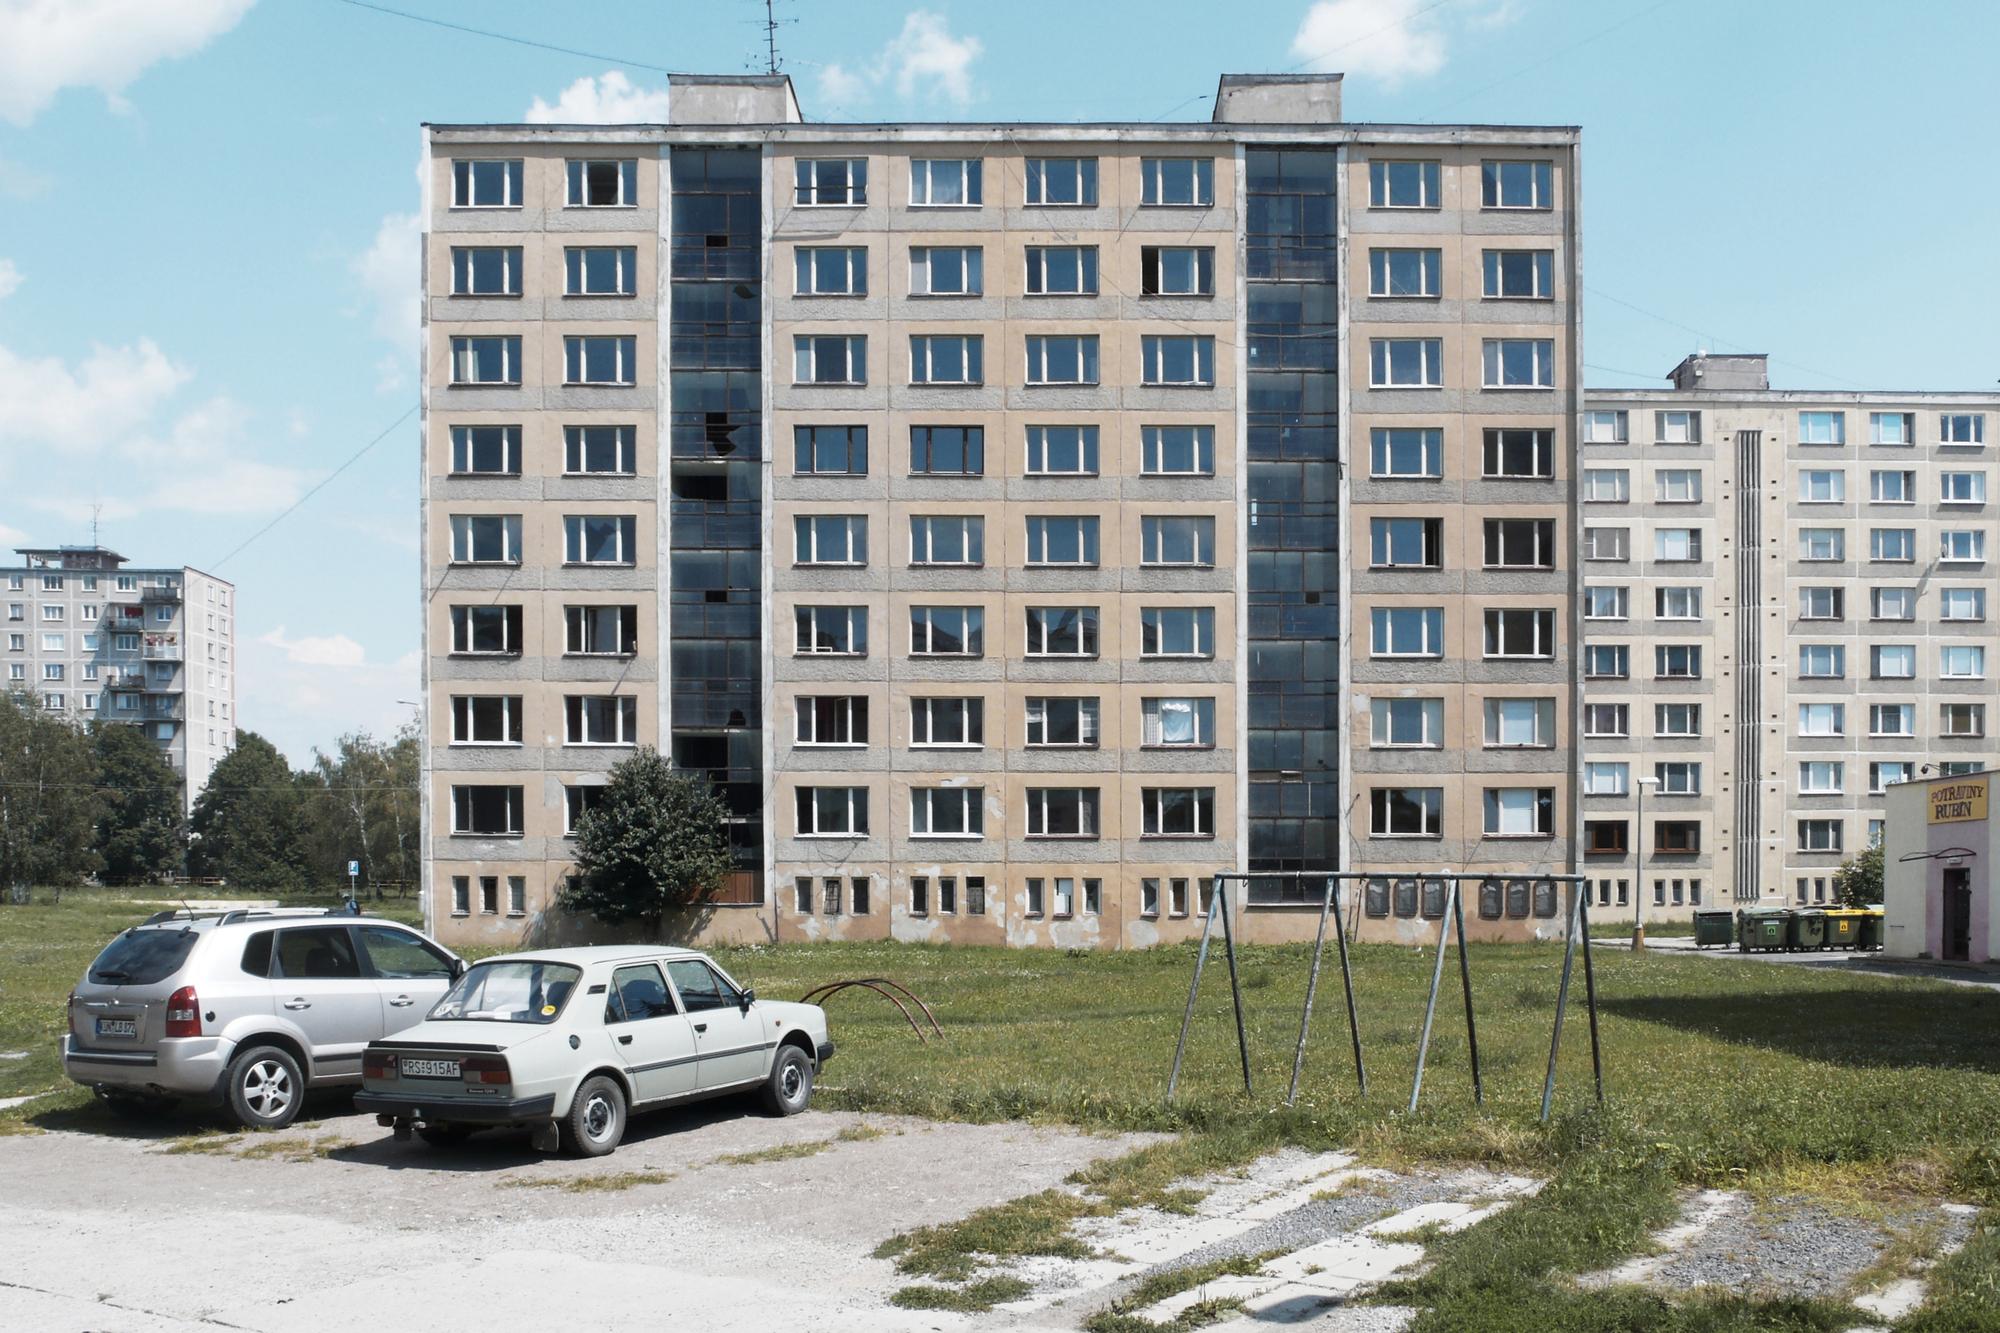 http://ad009cdnb.archdaily.net/wp-content/uploads/2015/02/54ecf722e58ece559800002c_prefab-house-in-rimavska-sobota-gutgut_gutgut_rimavska_sobota_initial01.jpg